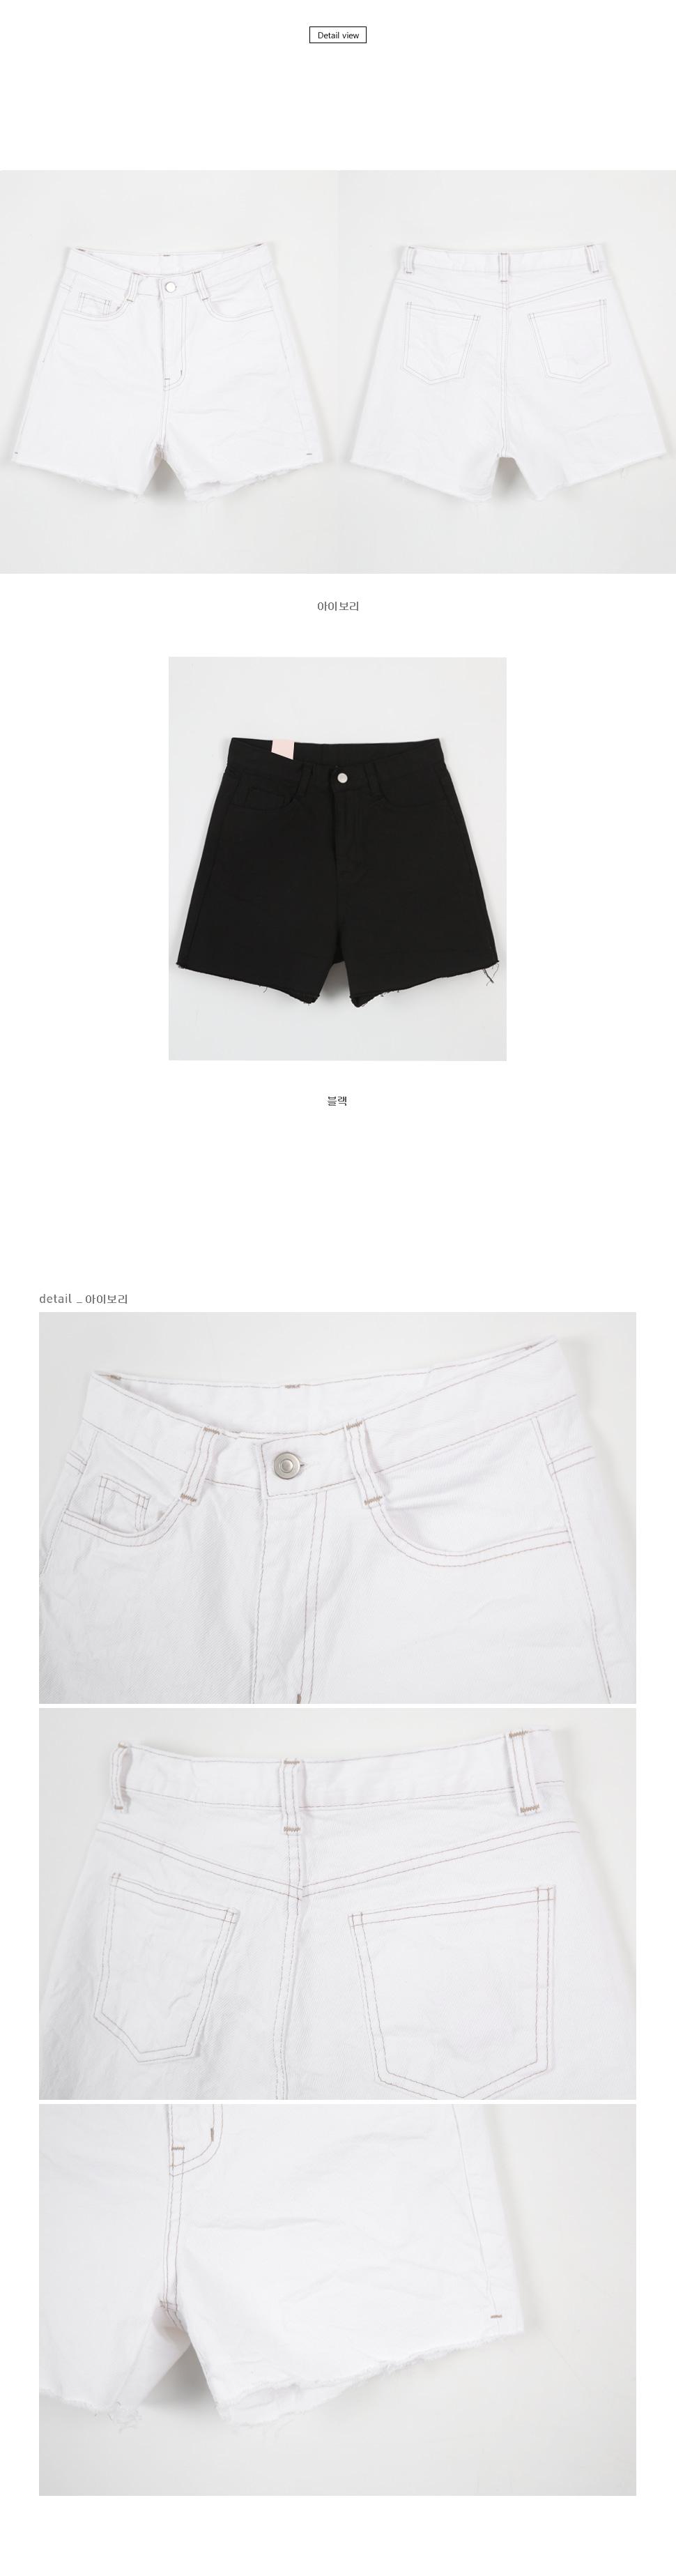 4 pieces of cotton shorts